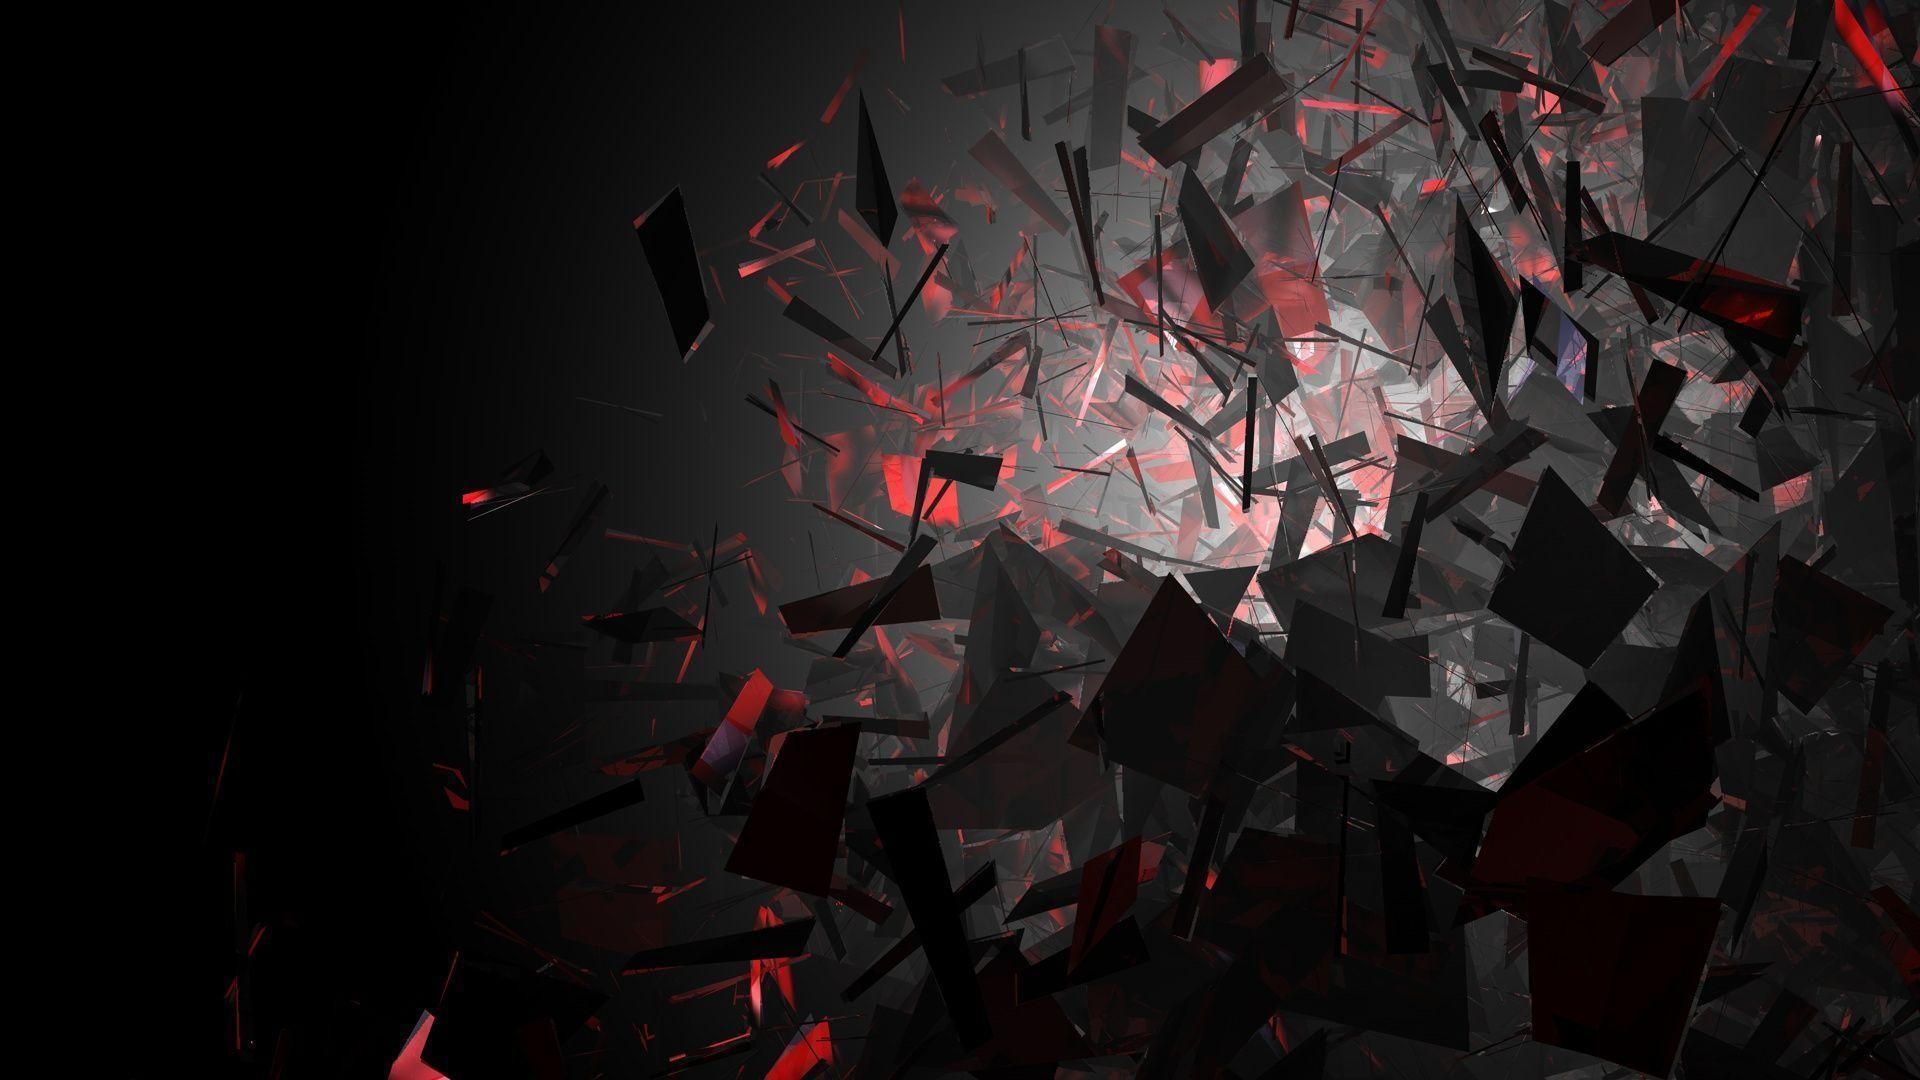 Dark Abstract Wallpaper   Download HD Wallpapers